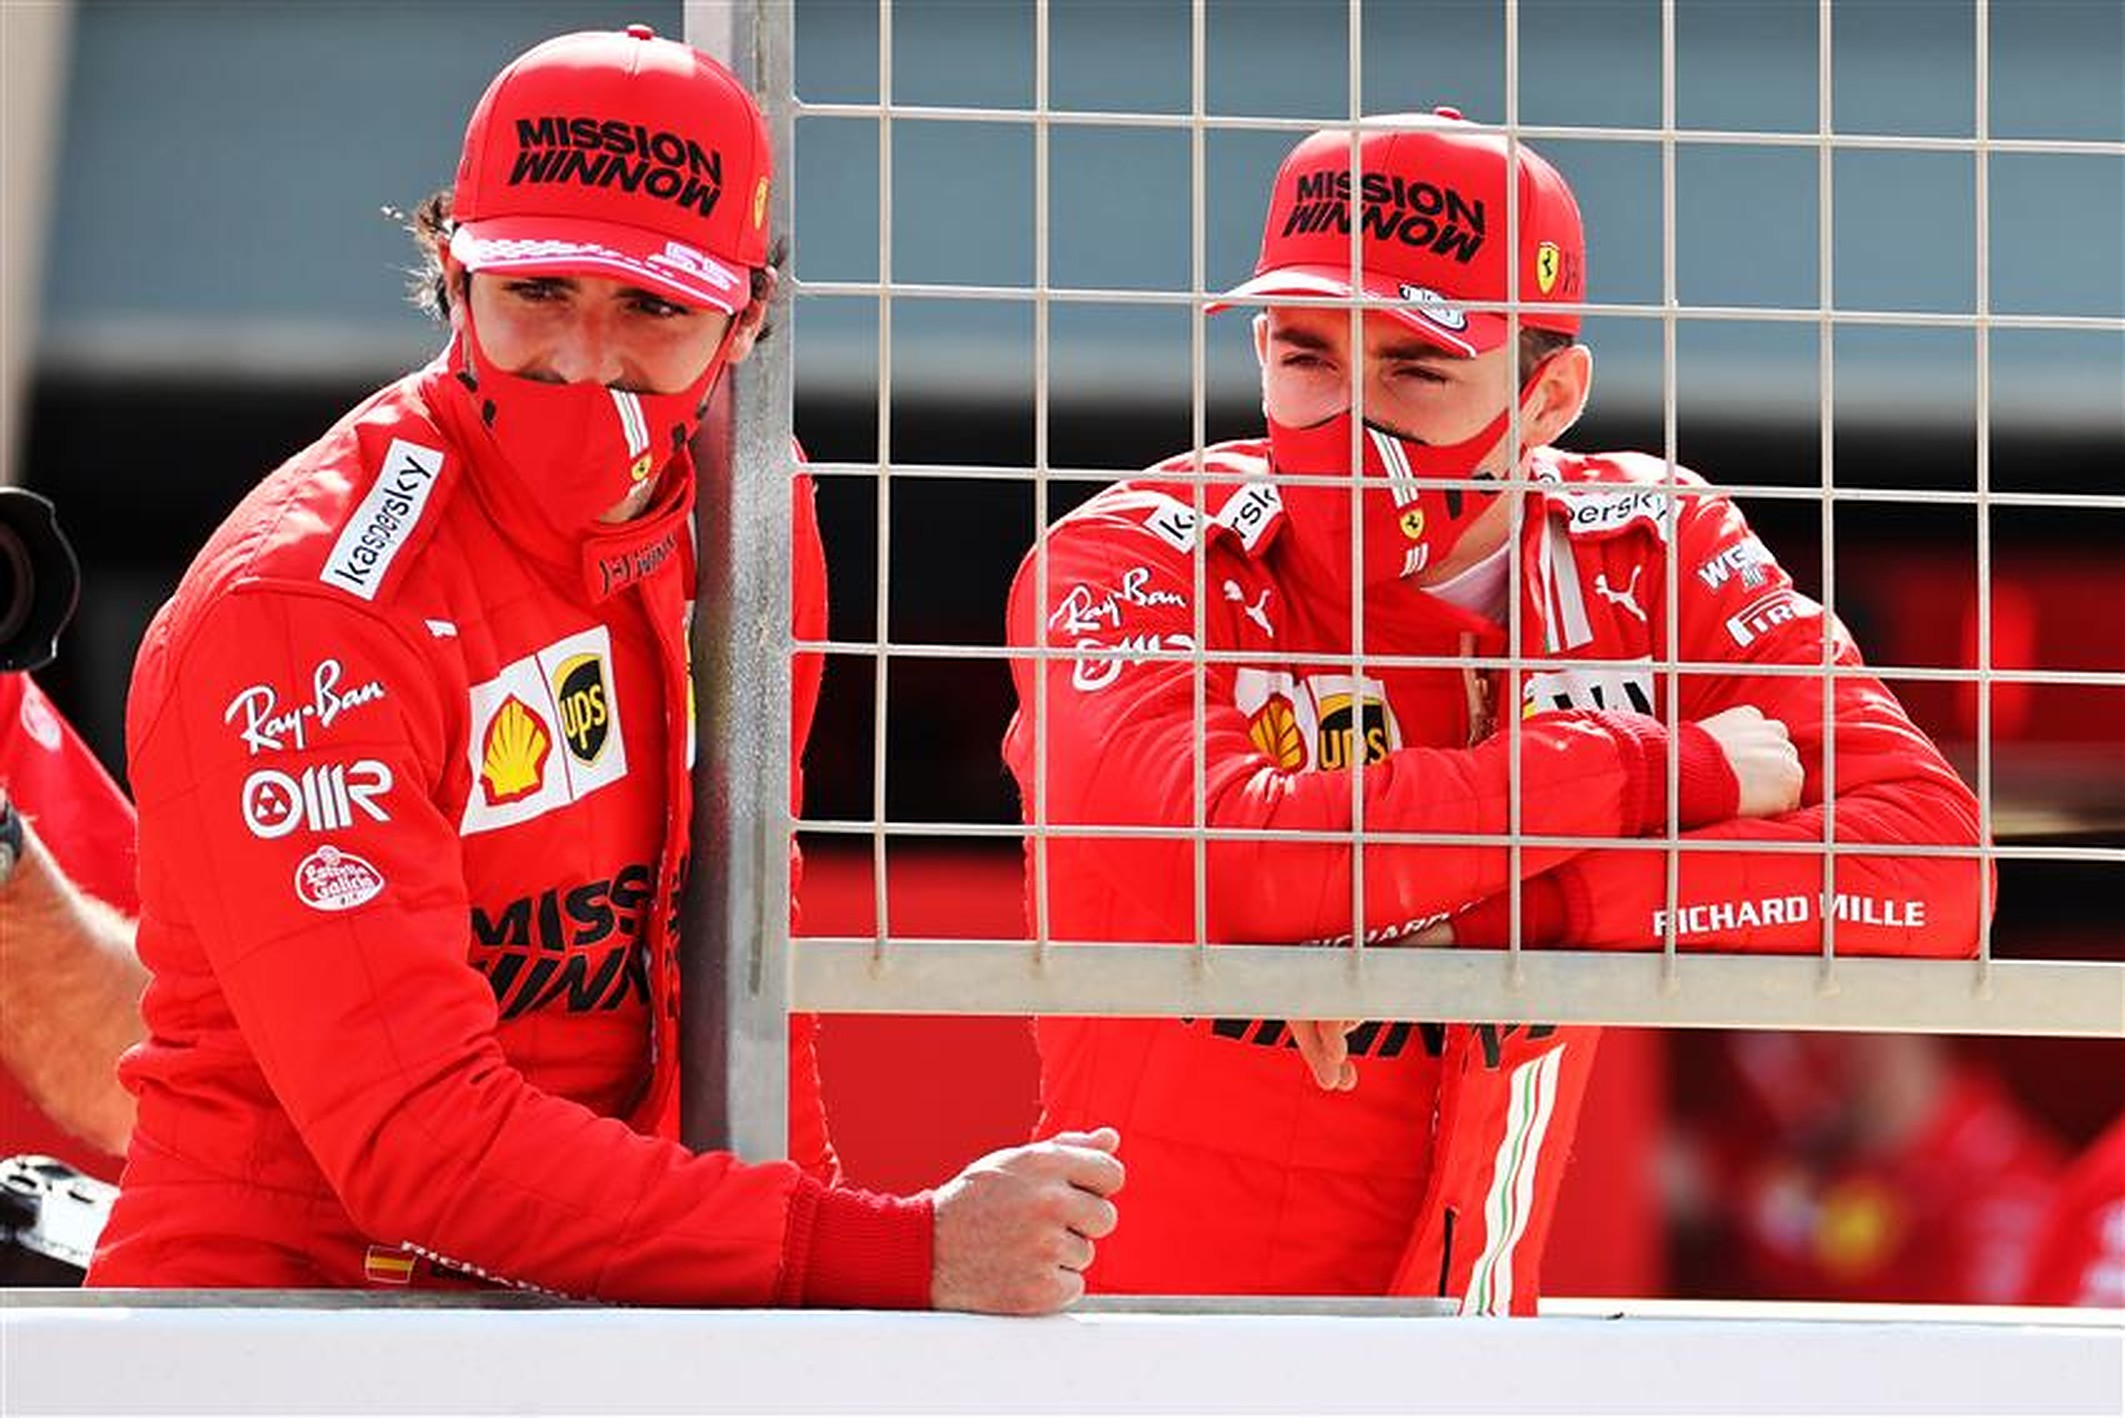 Carlos Sainz and Charles Leclerc at Ferrari 2021 - Formula1news.co.uk